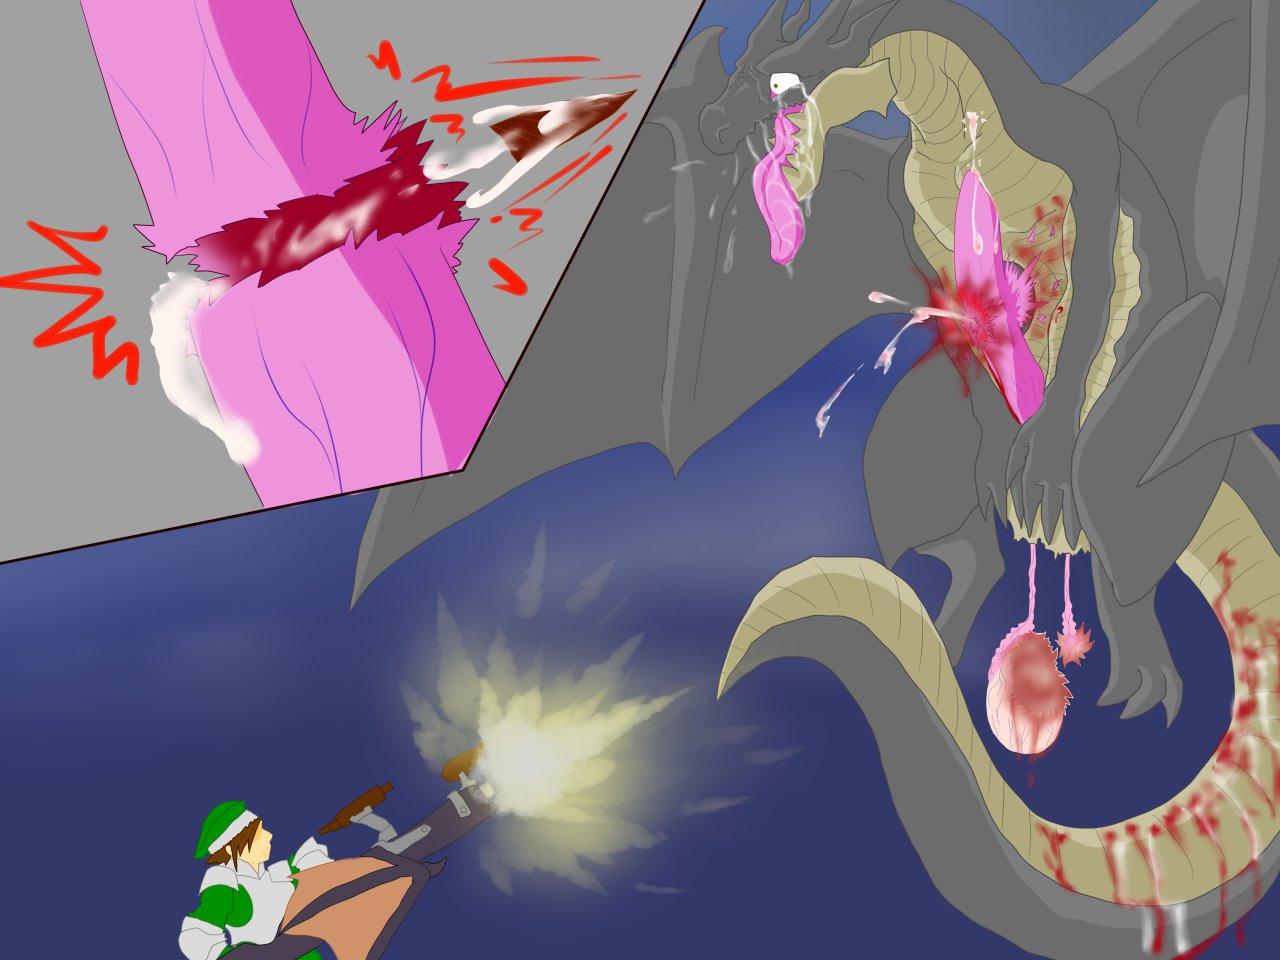 monster hunter deviljho world armor How to use skyrim sexlab